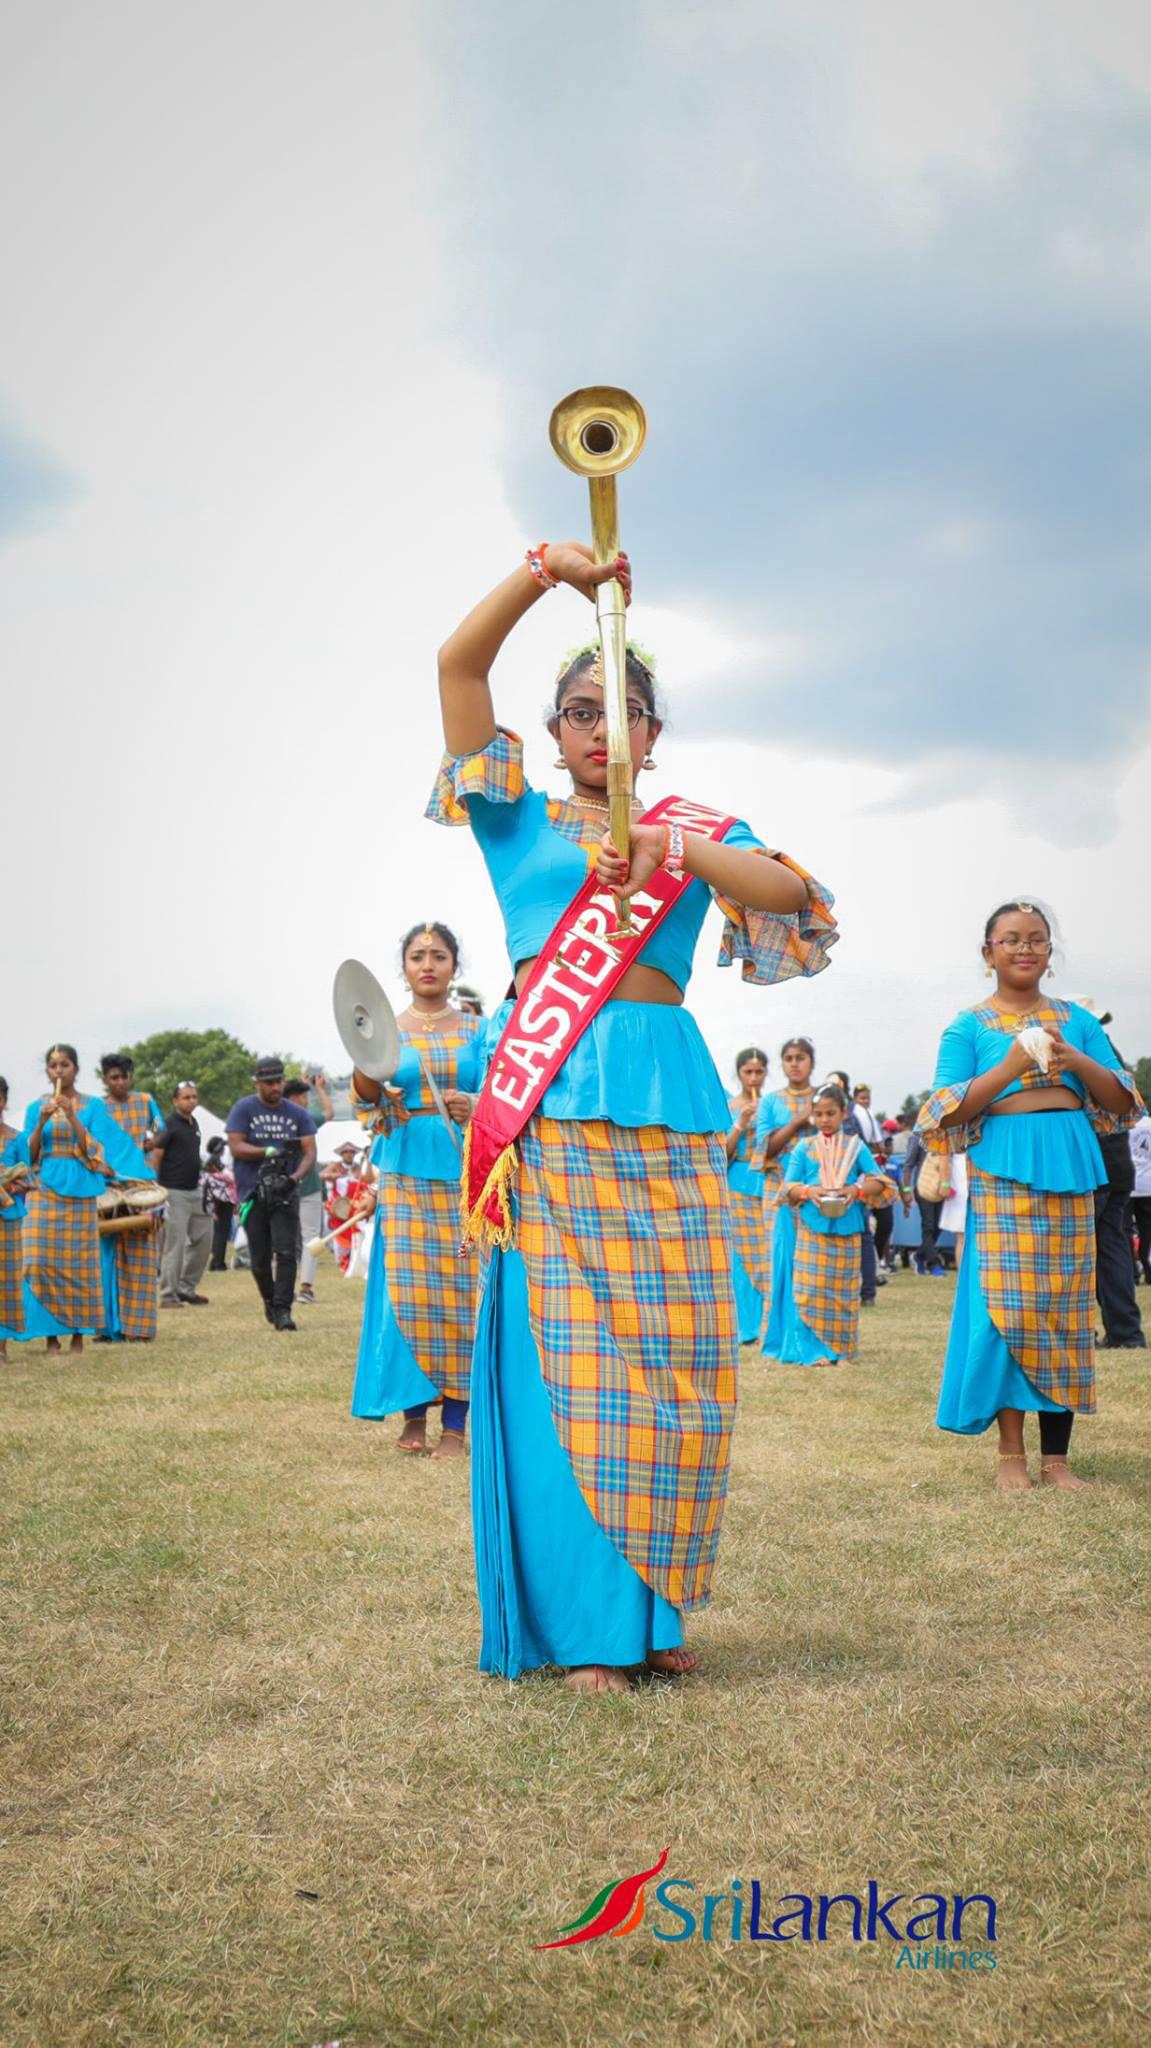 Sri-Lankan-airlines-cricket-festival-london-2017-natalia-smith-photography-Kandyan-dance-11.jpg